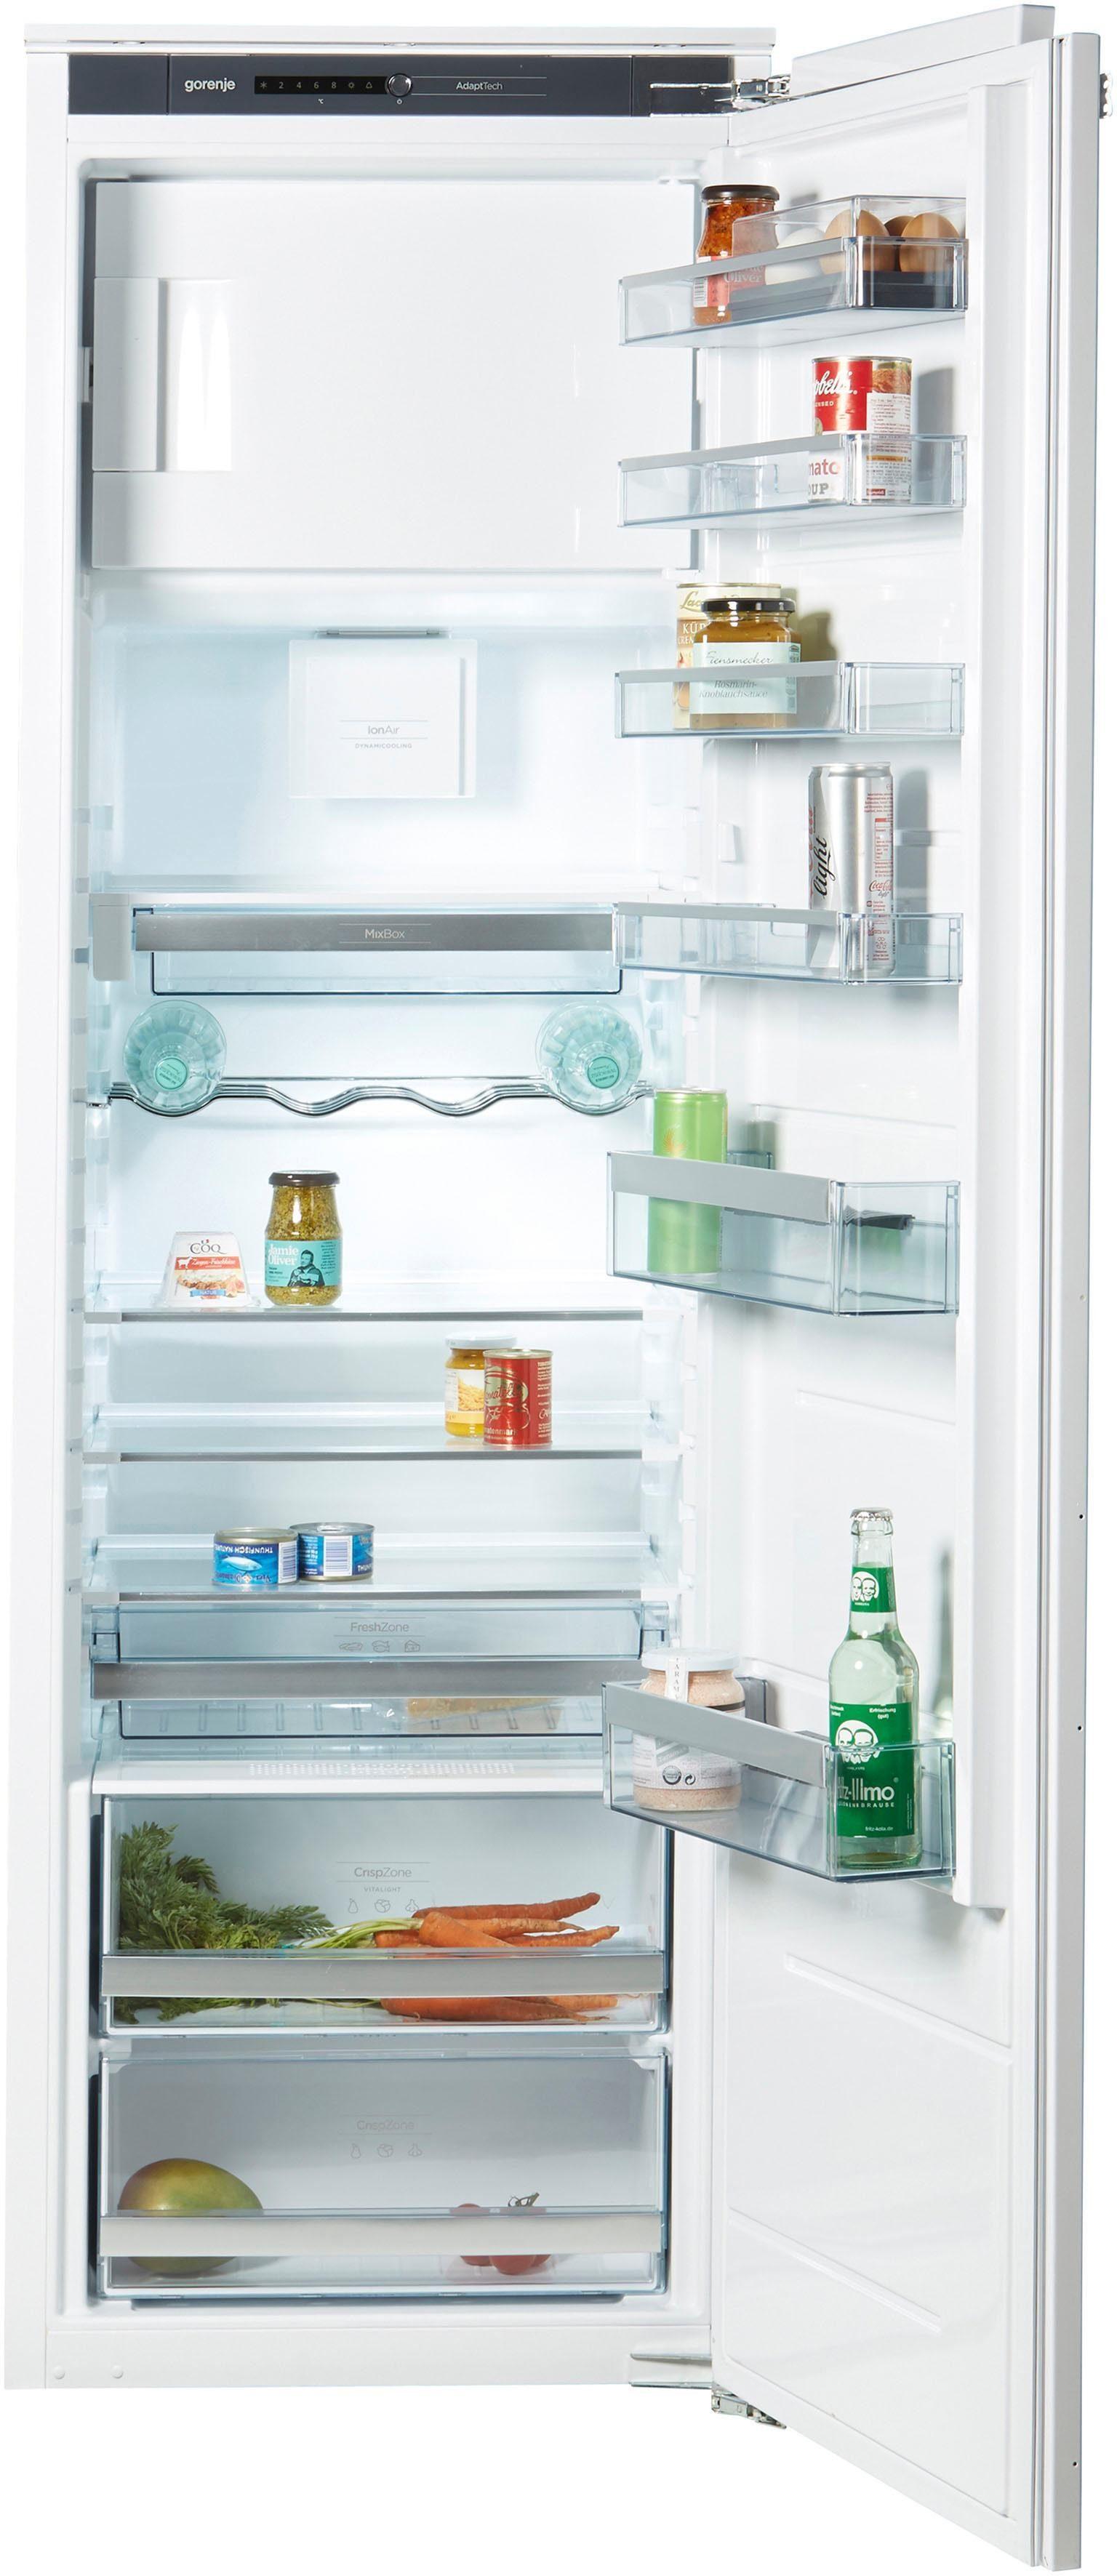 GORENJE Einbaukühlschrank RBI5183A1, 177,2 cm hoch, 55,5 cm breit